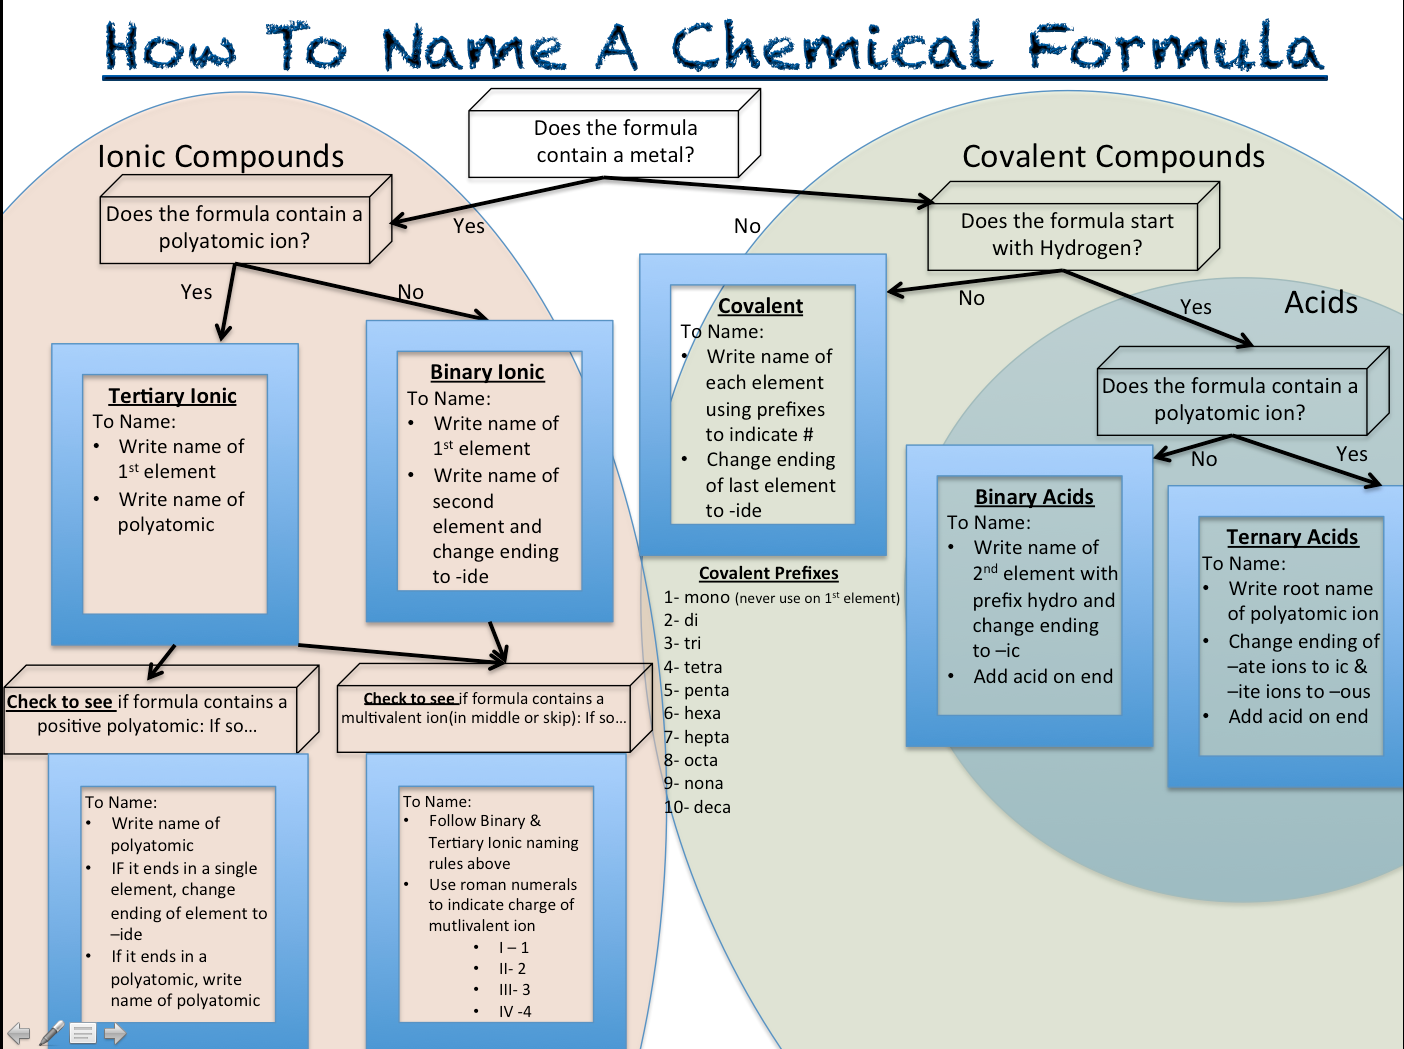 1Stoichiometry & Nomenclature Mrs. Portwood's Class